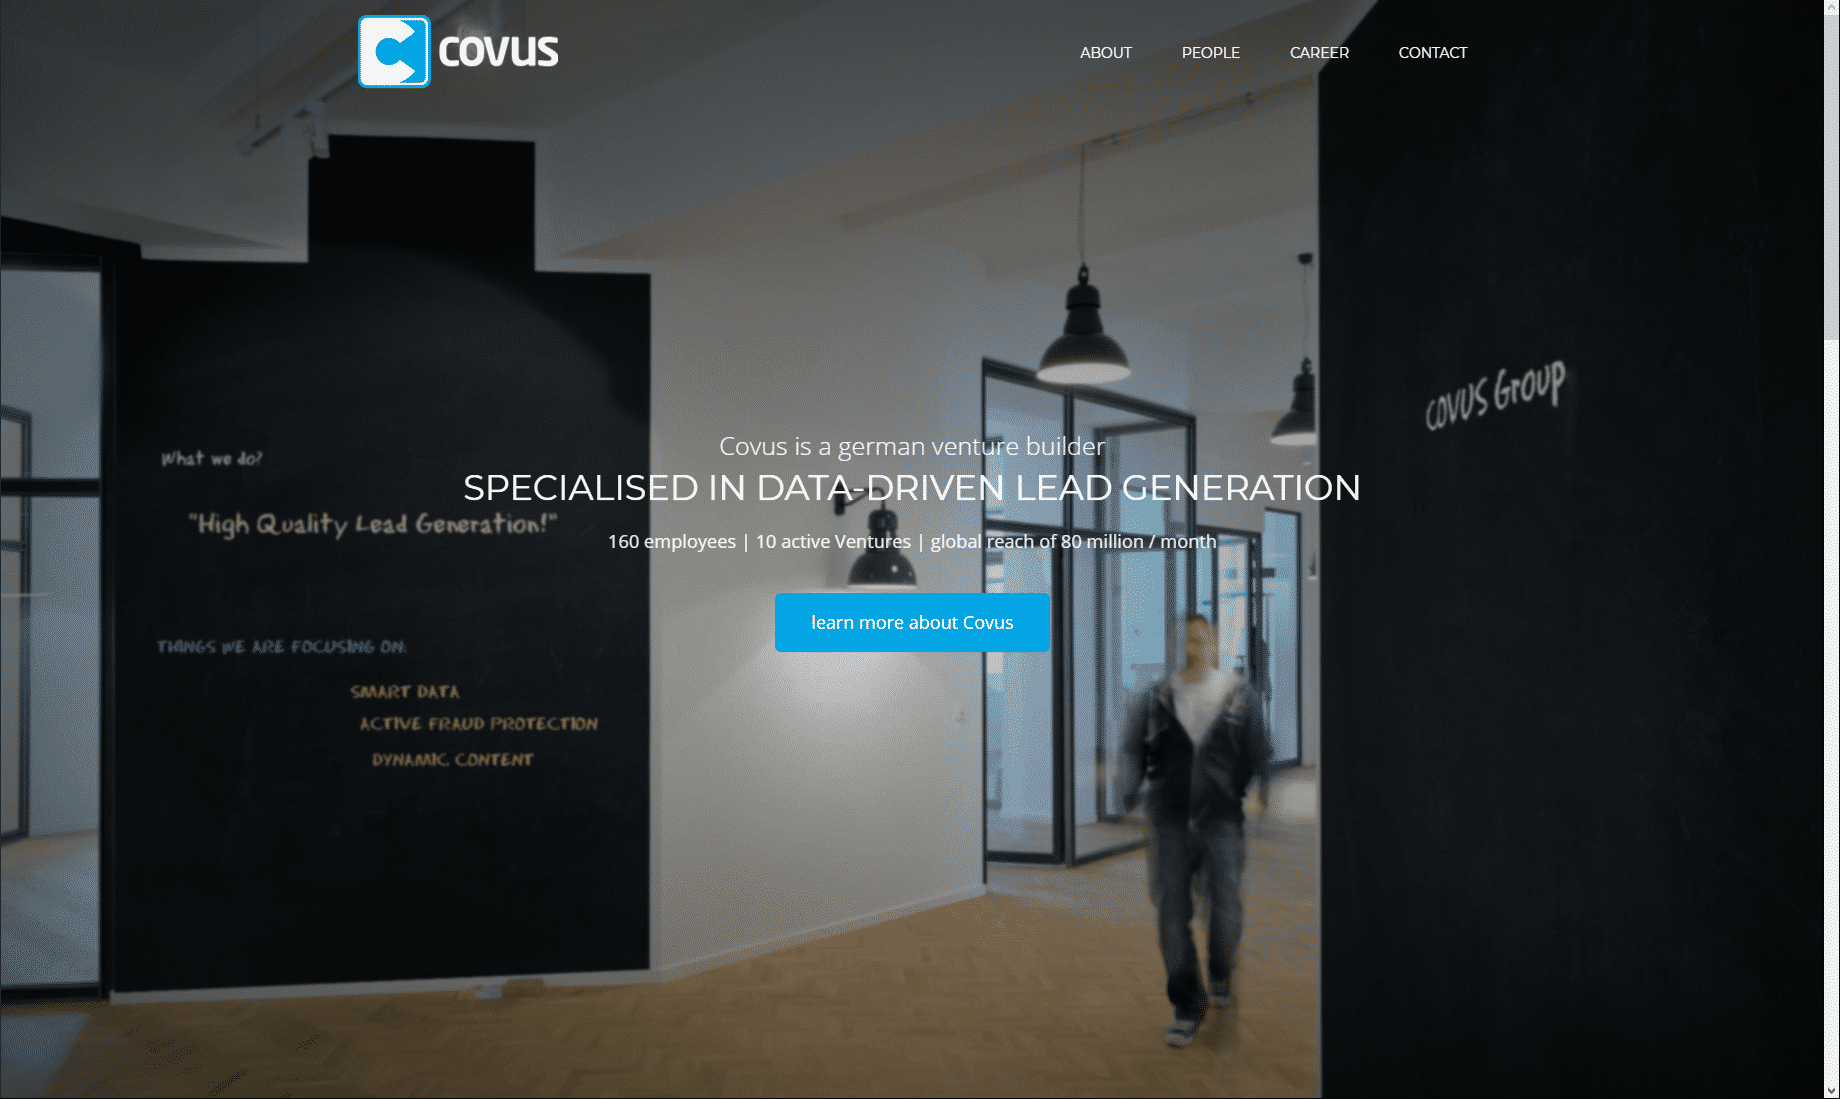 covus.com